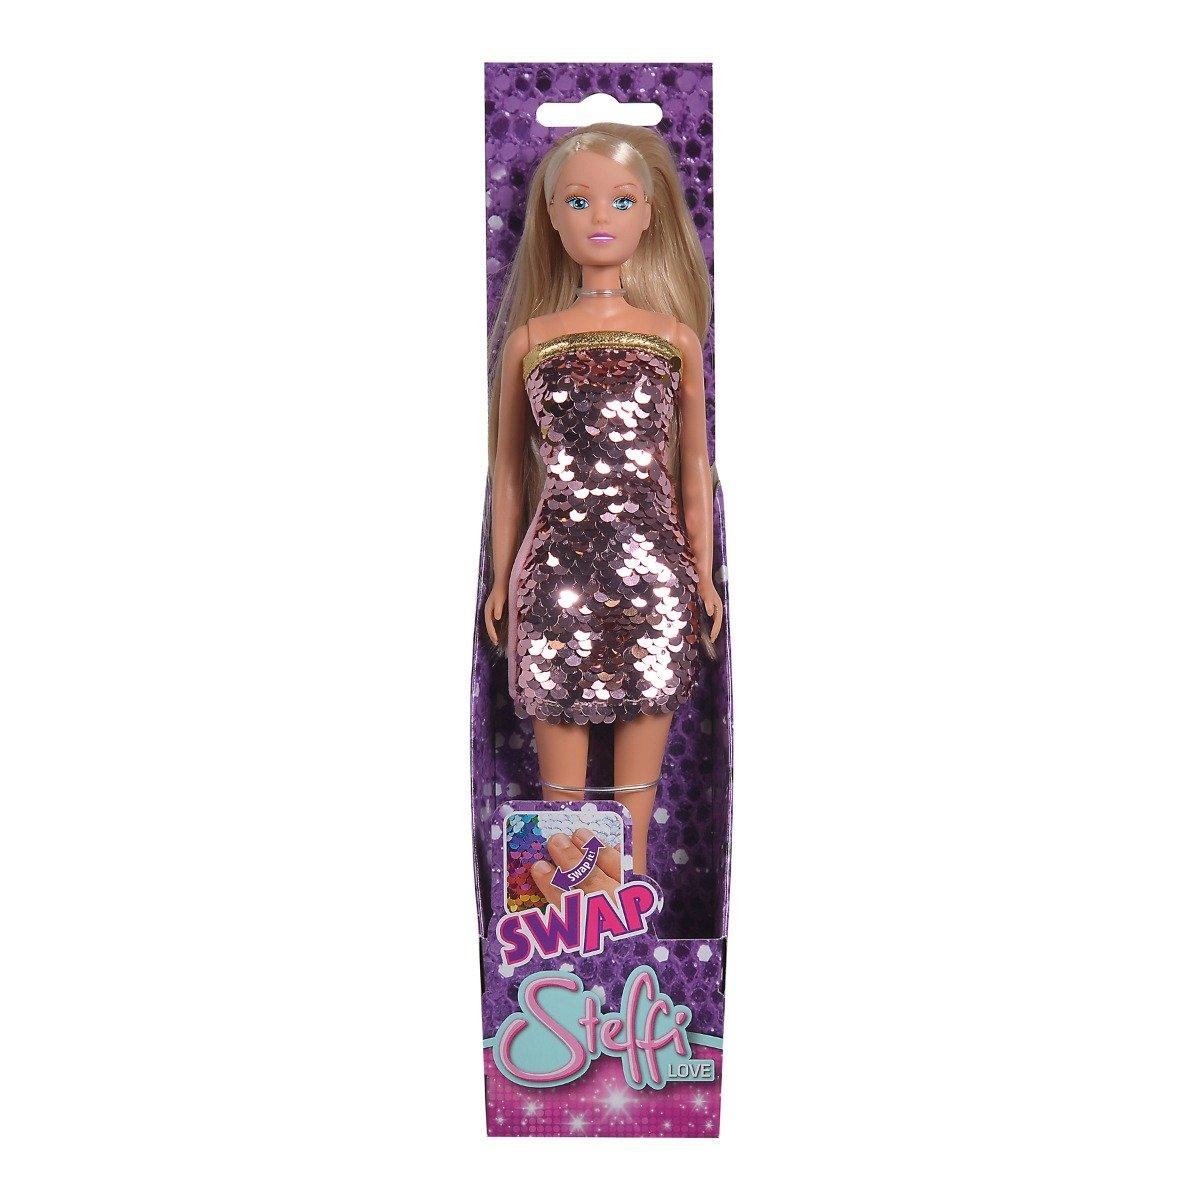 Papusa Steffi Love in rochie cu paiete, Roz pal